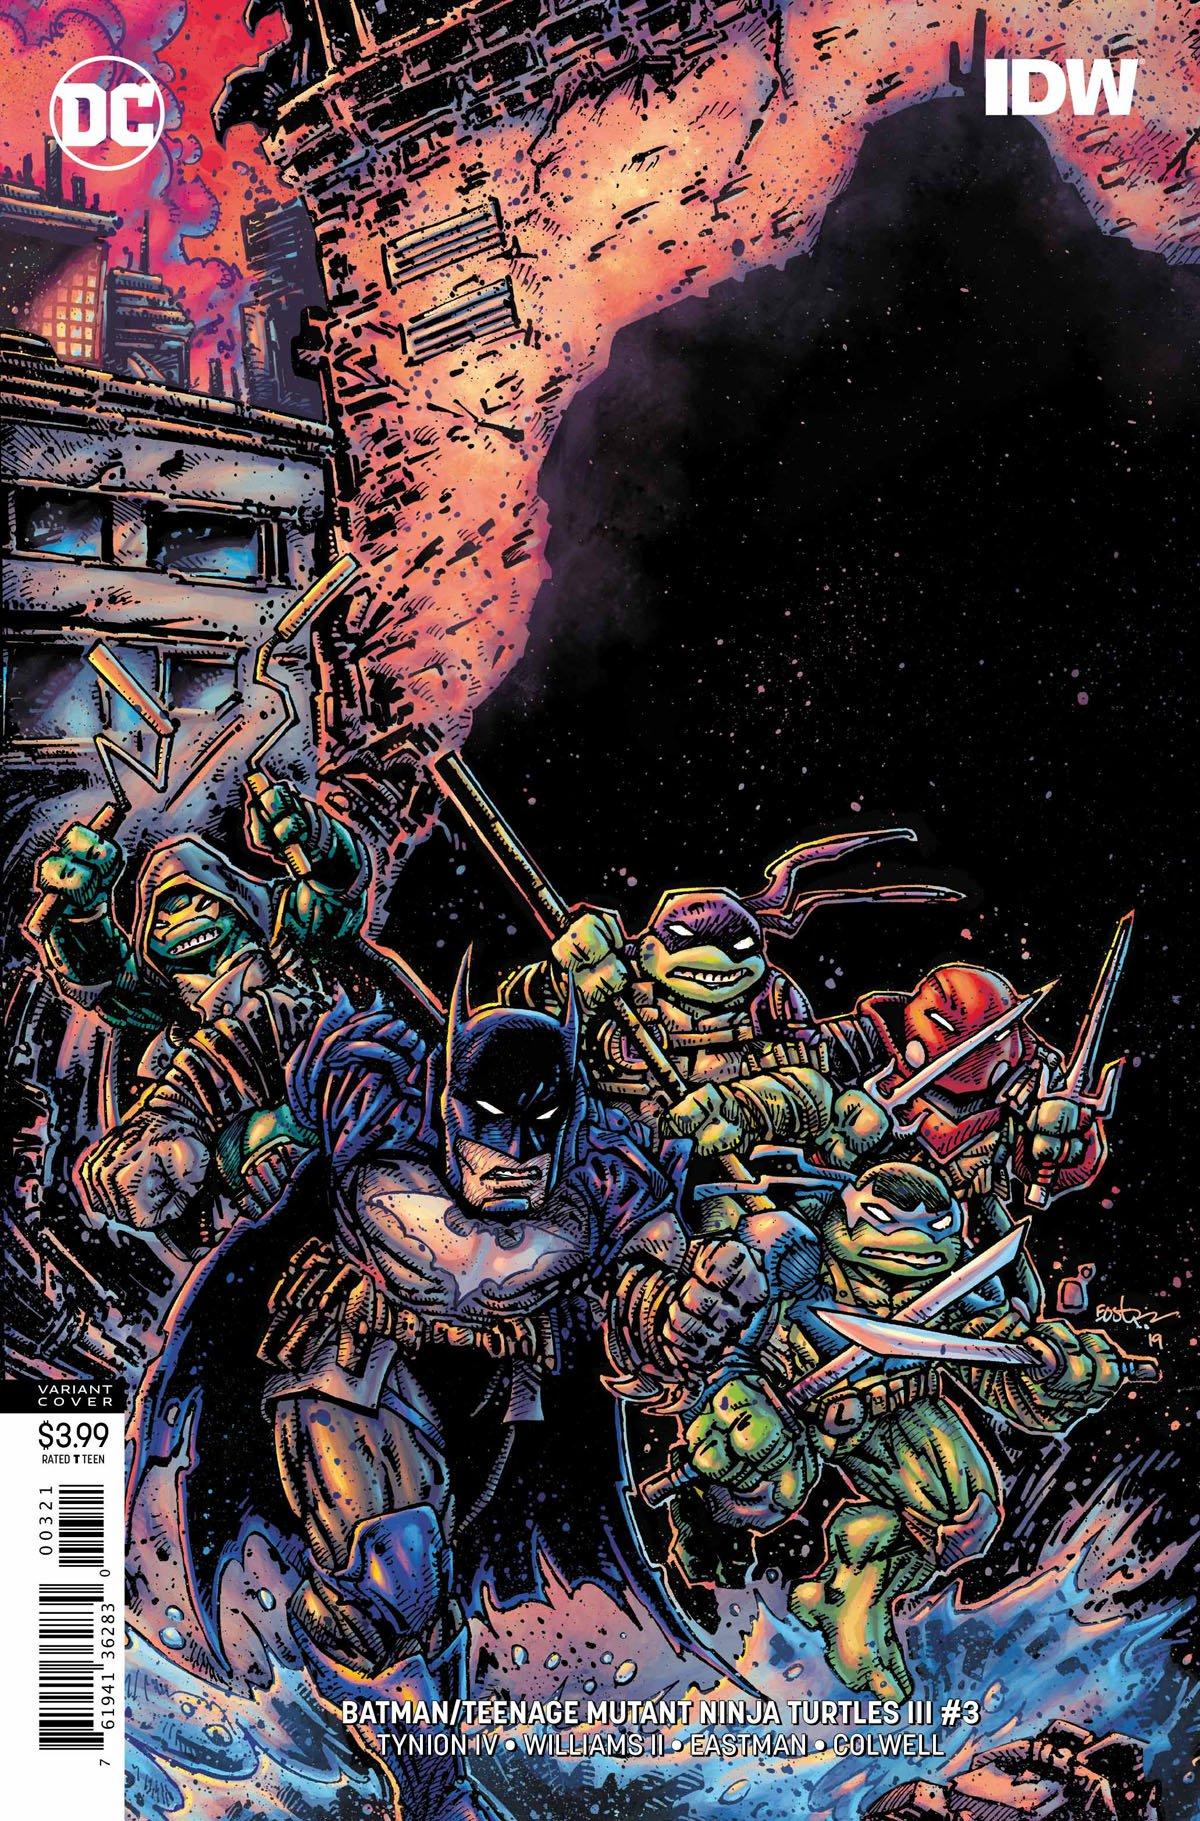 batman-tmnt-iii-issue-3-variant-cover.jpg